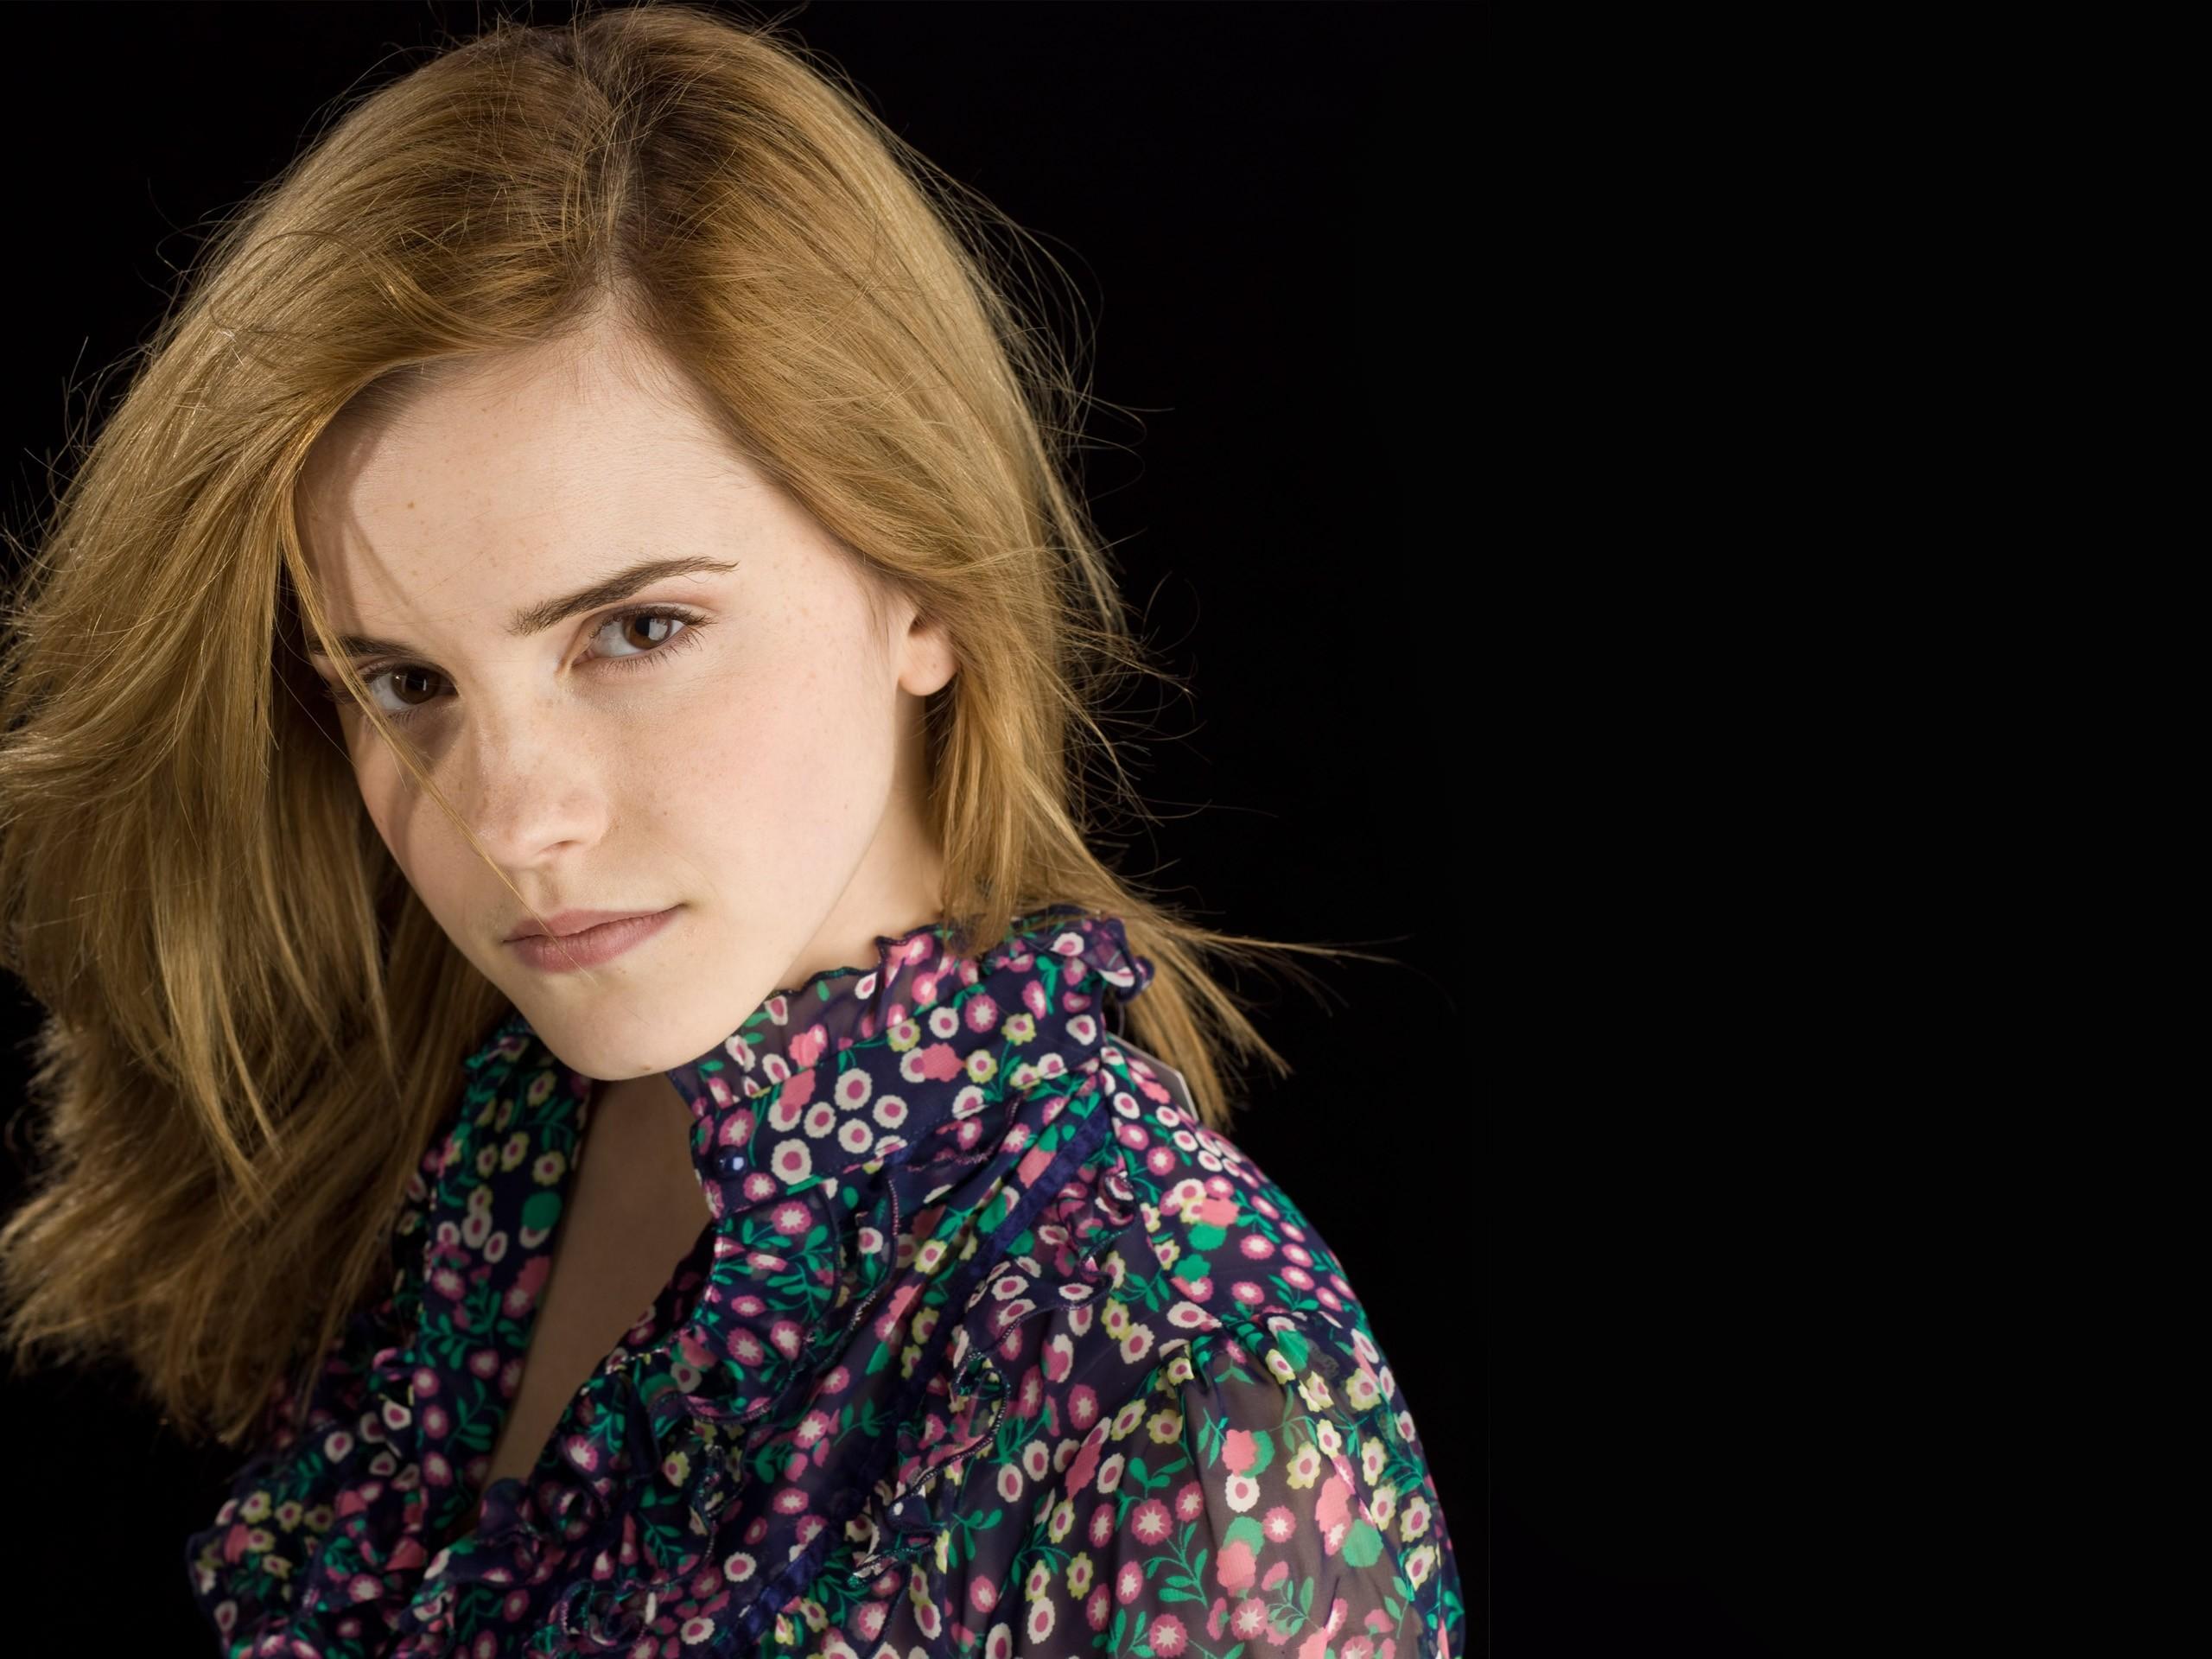 Amazing High Definition Images of Beautiful Emma Watson (2), Full HD  1080p